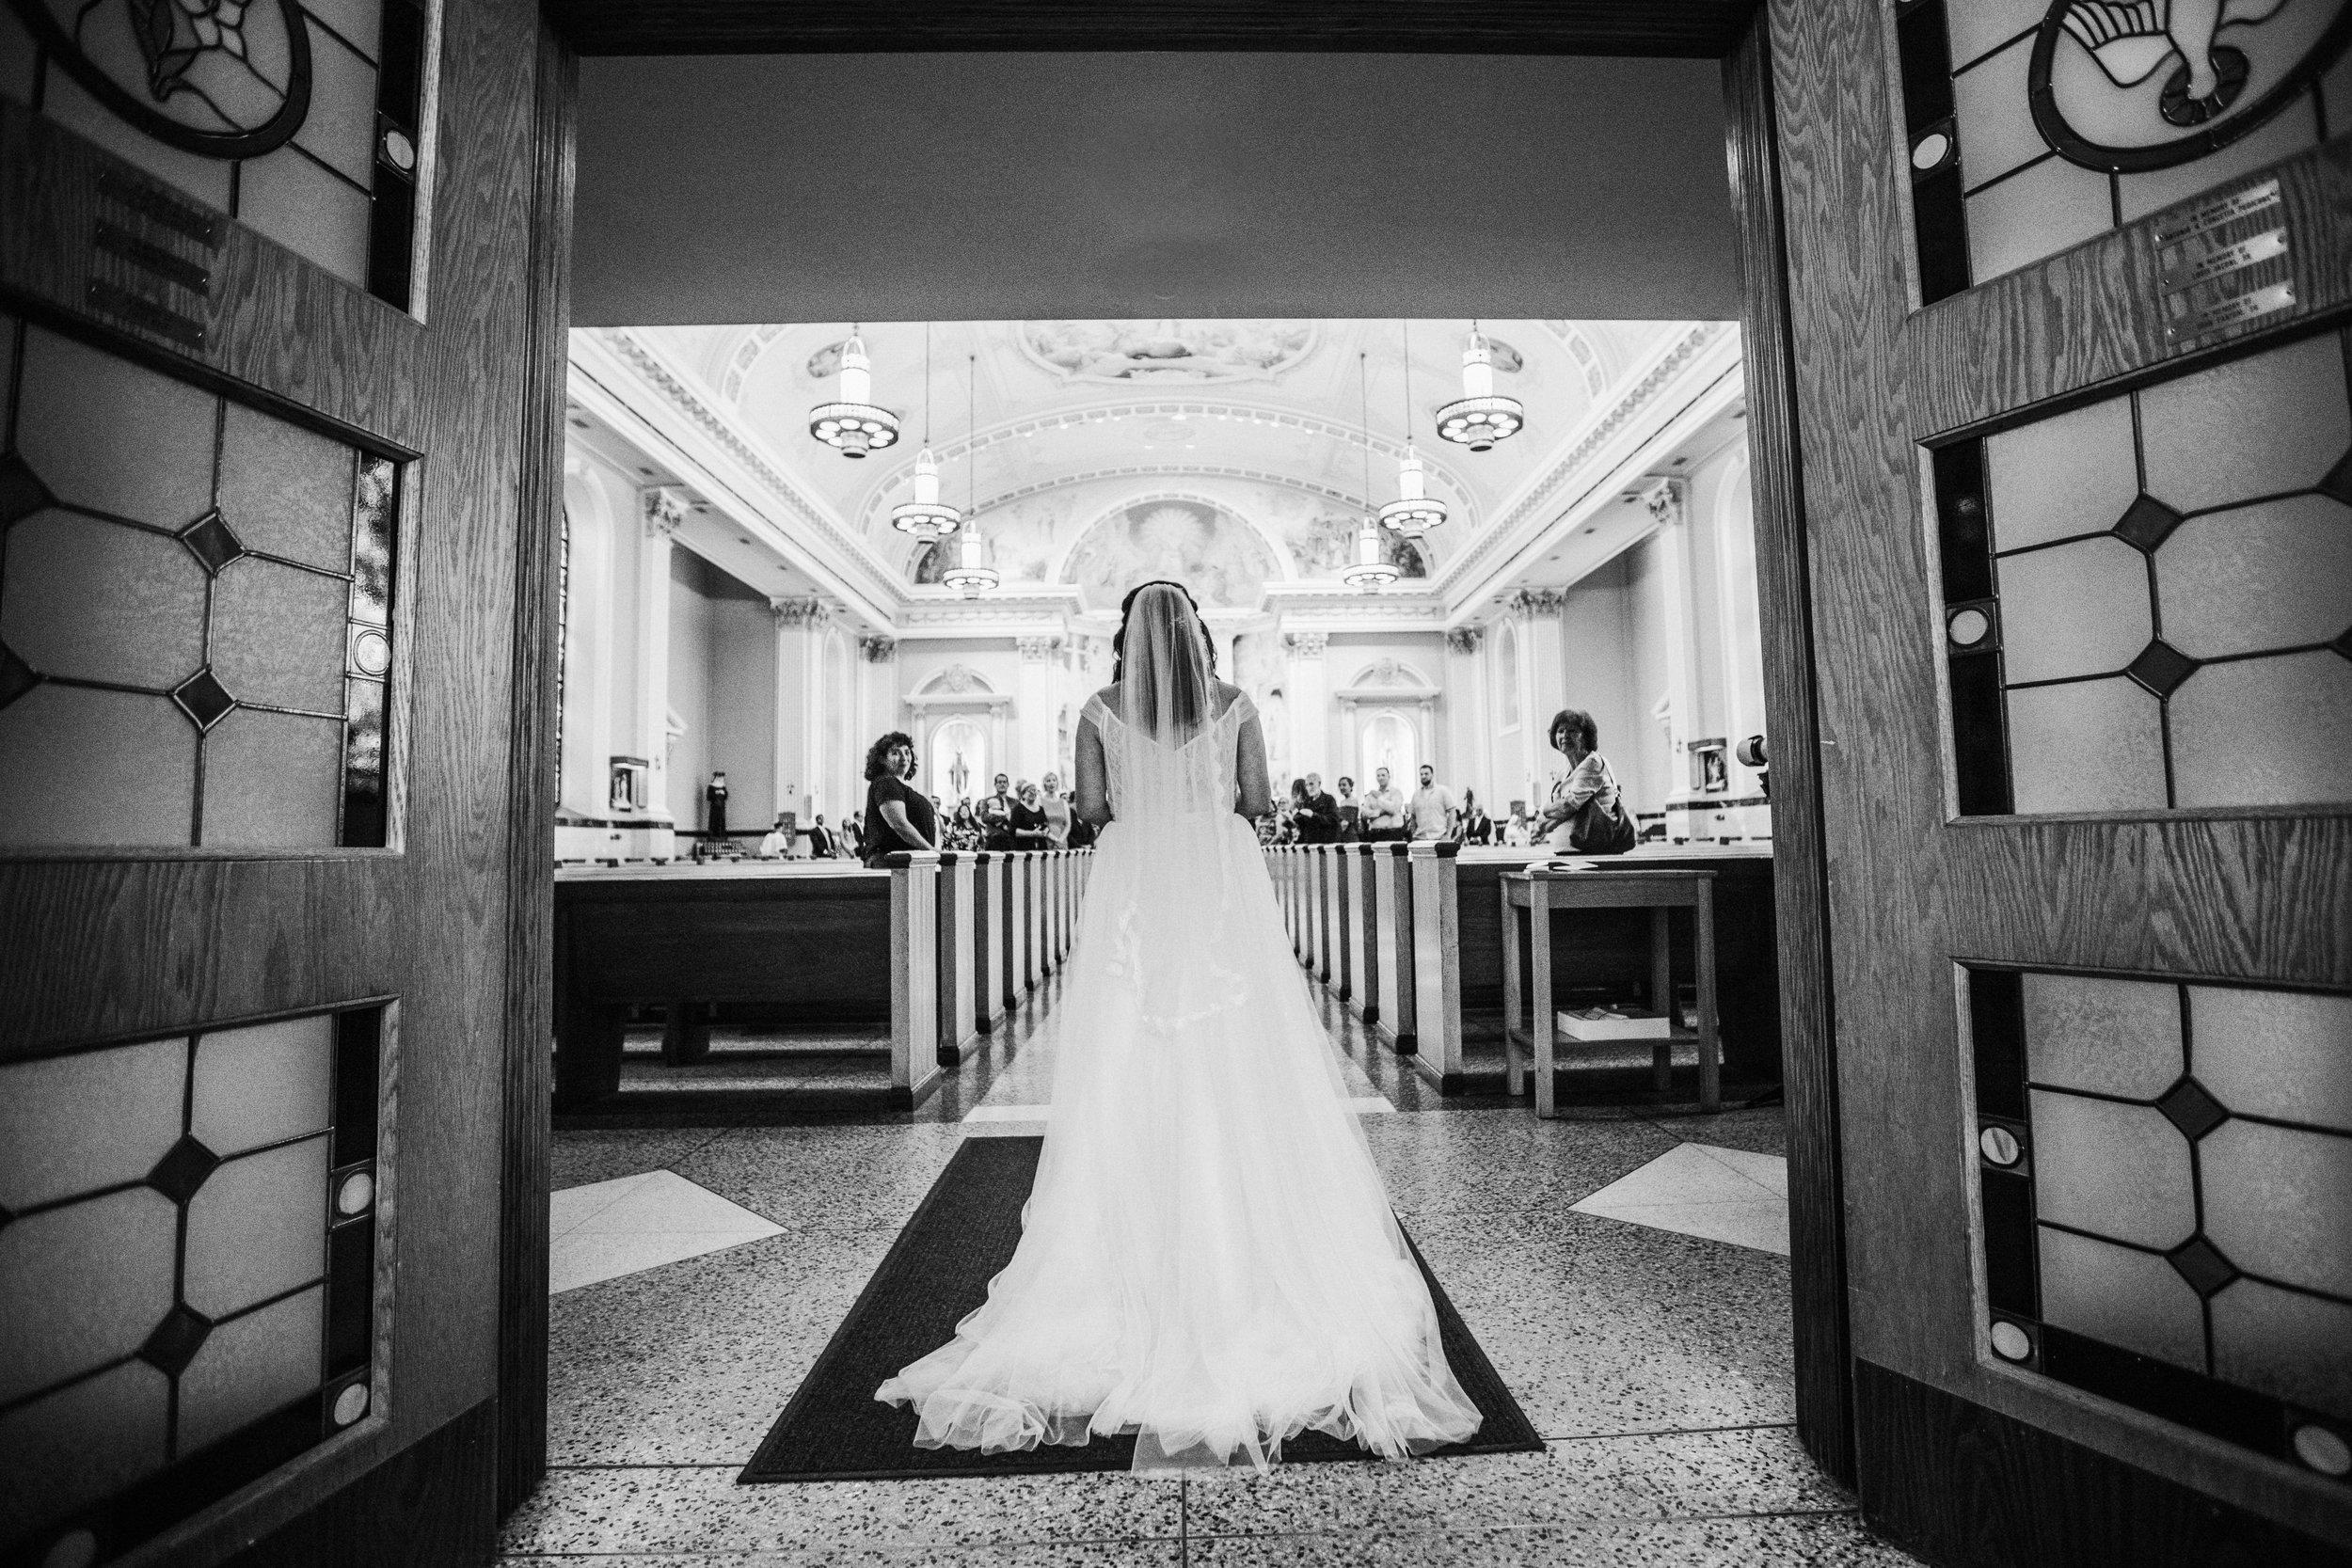 JennaLynnPhotography-NJWeddingPhotographer-Philadelphia-Wedding-ArtsBallroom-CeremonyBW-88.jpg